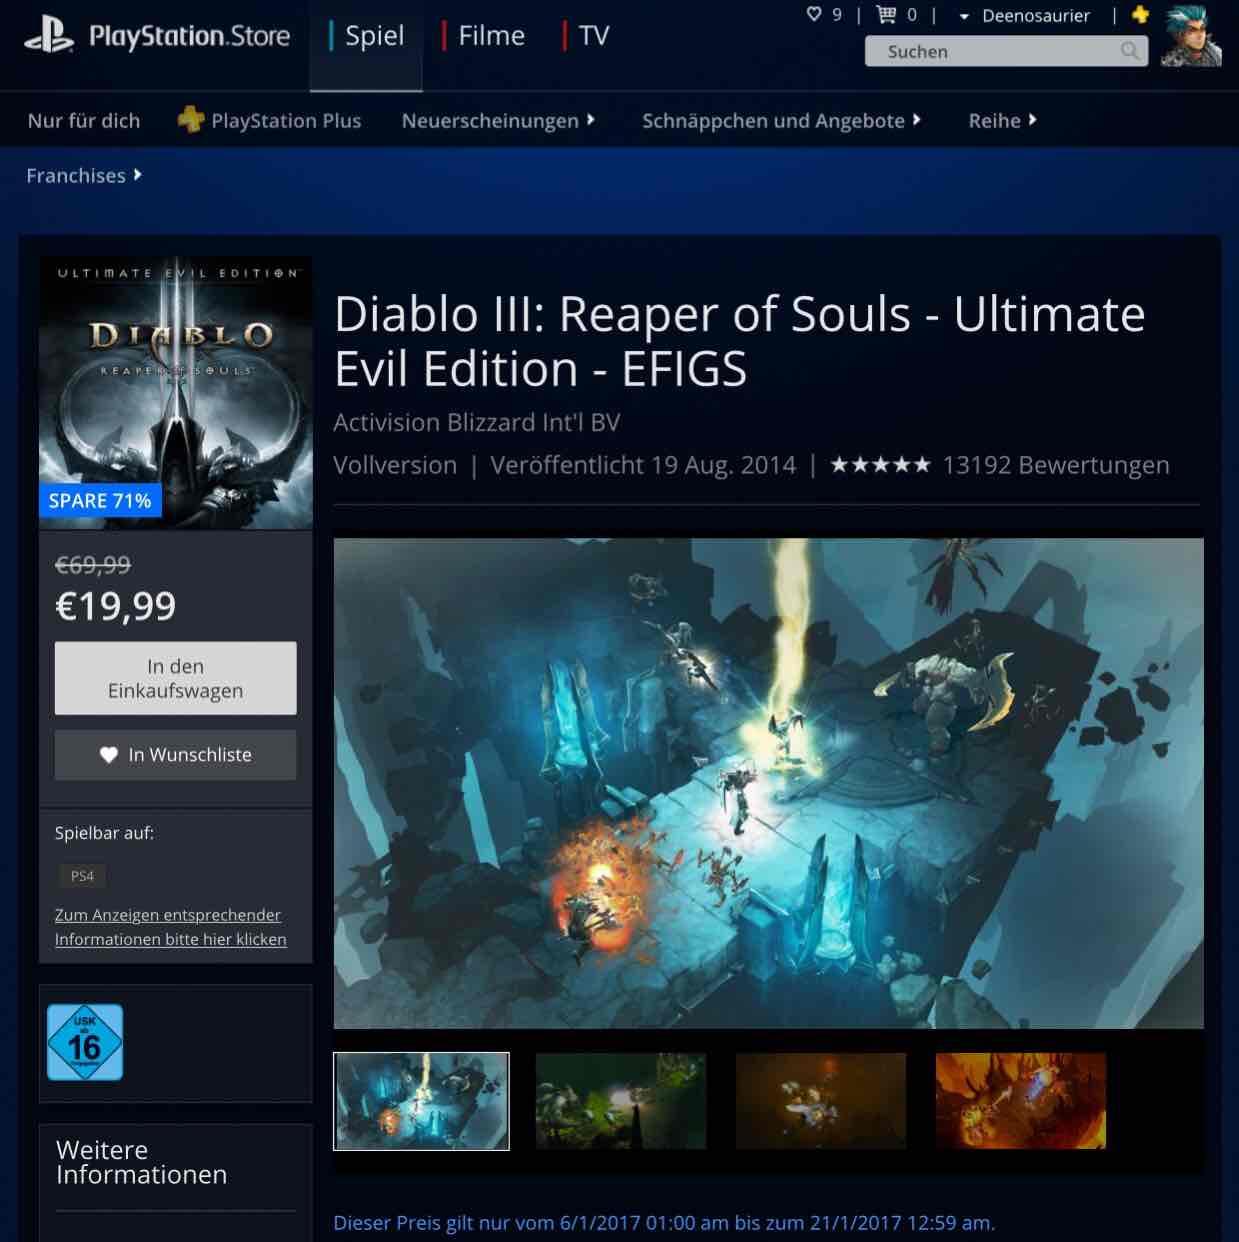 [PS4 PSN] Diablo III: Reaper of Souls - Ultimate Evil Edition - EFIGS 19,99€